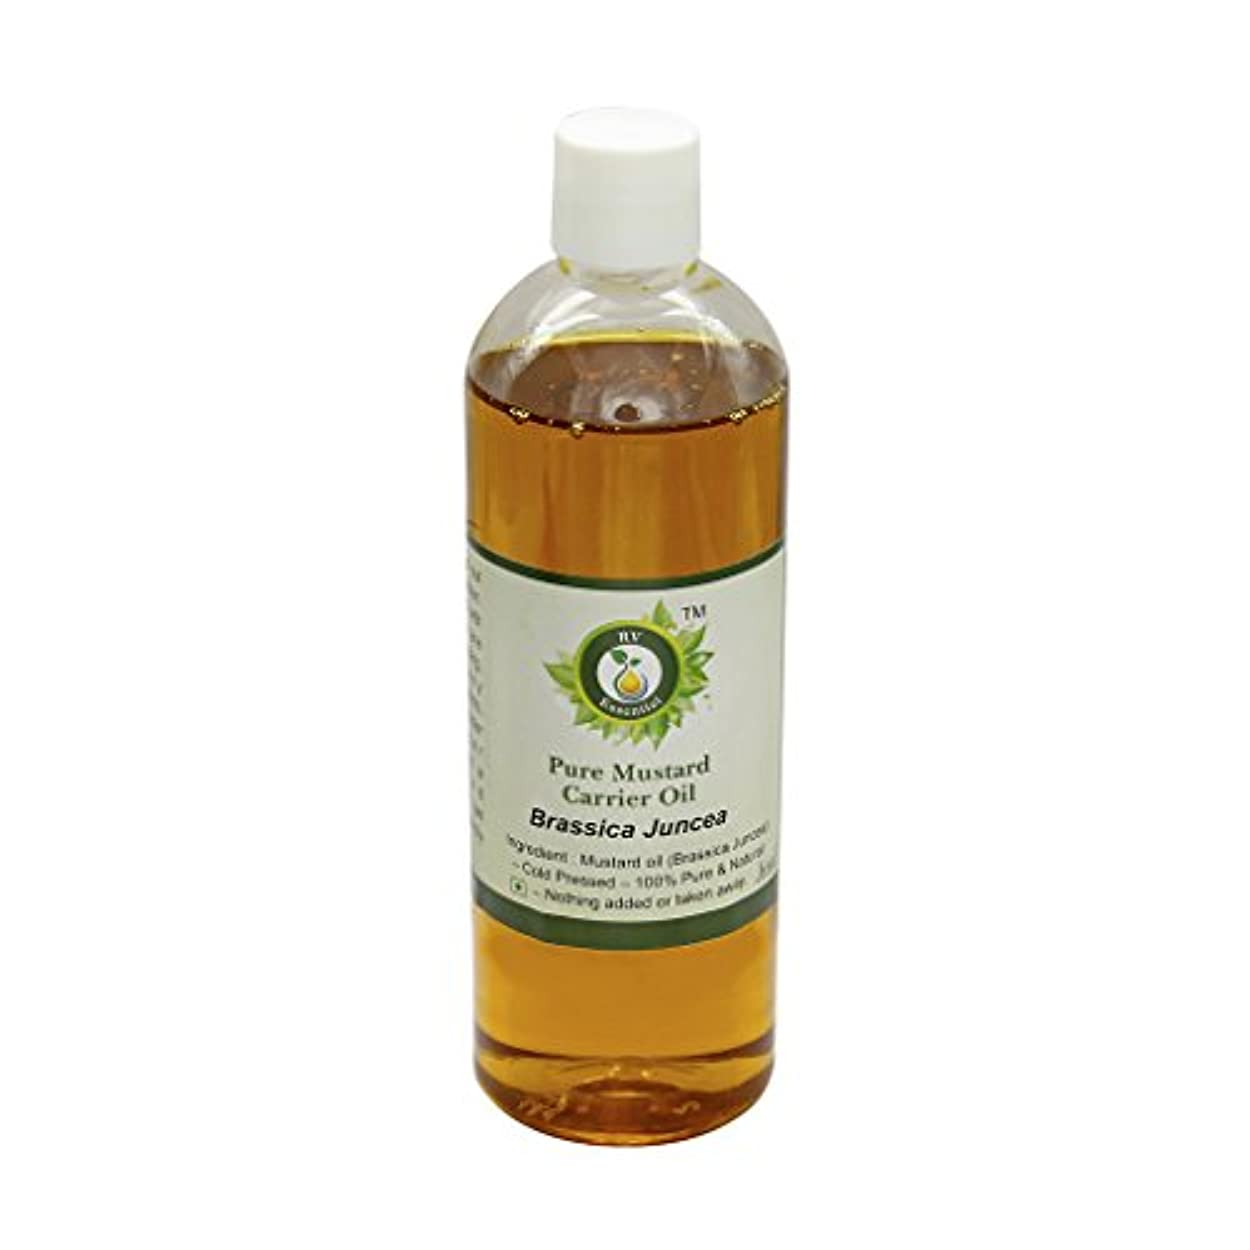 R V Essential 純粋なマスタードキャリアオイル100ml (3.38oz)- Brassica Juncea (100%ピュア&ナチュラルコールドPressed) Pure Mustard Carrier Oil